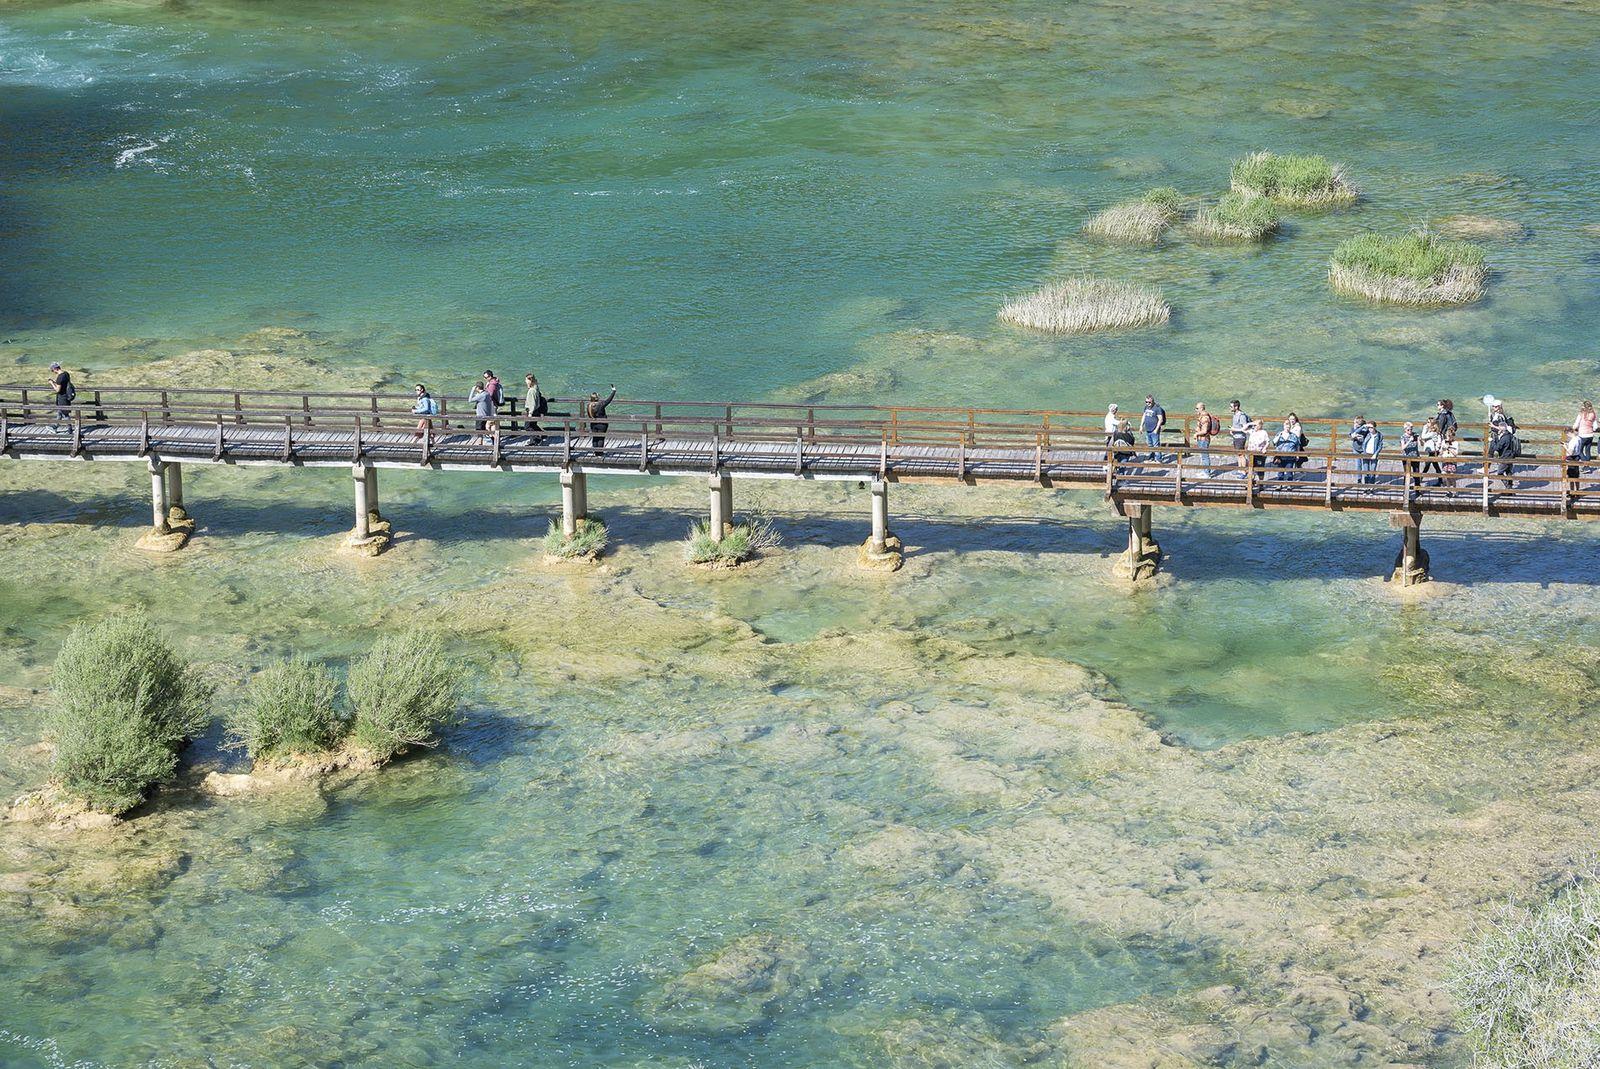 From waterfalls to wilderness: exploring Croatia's Dalmatian hinterlands